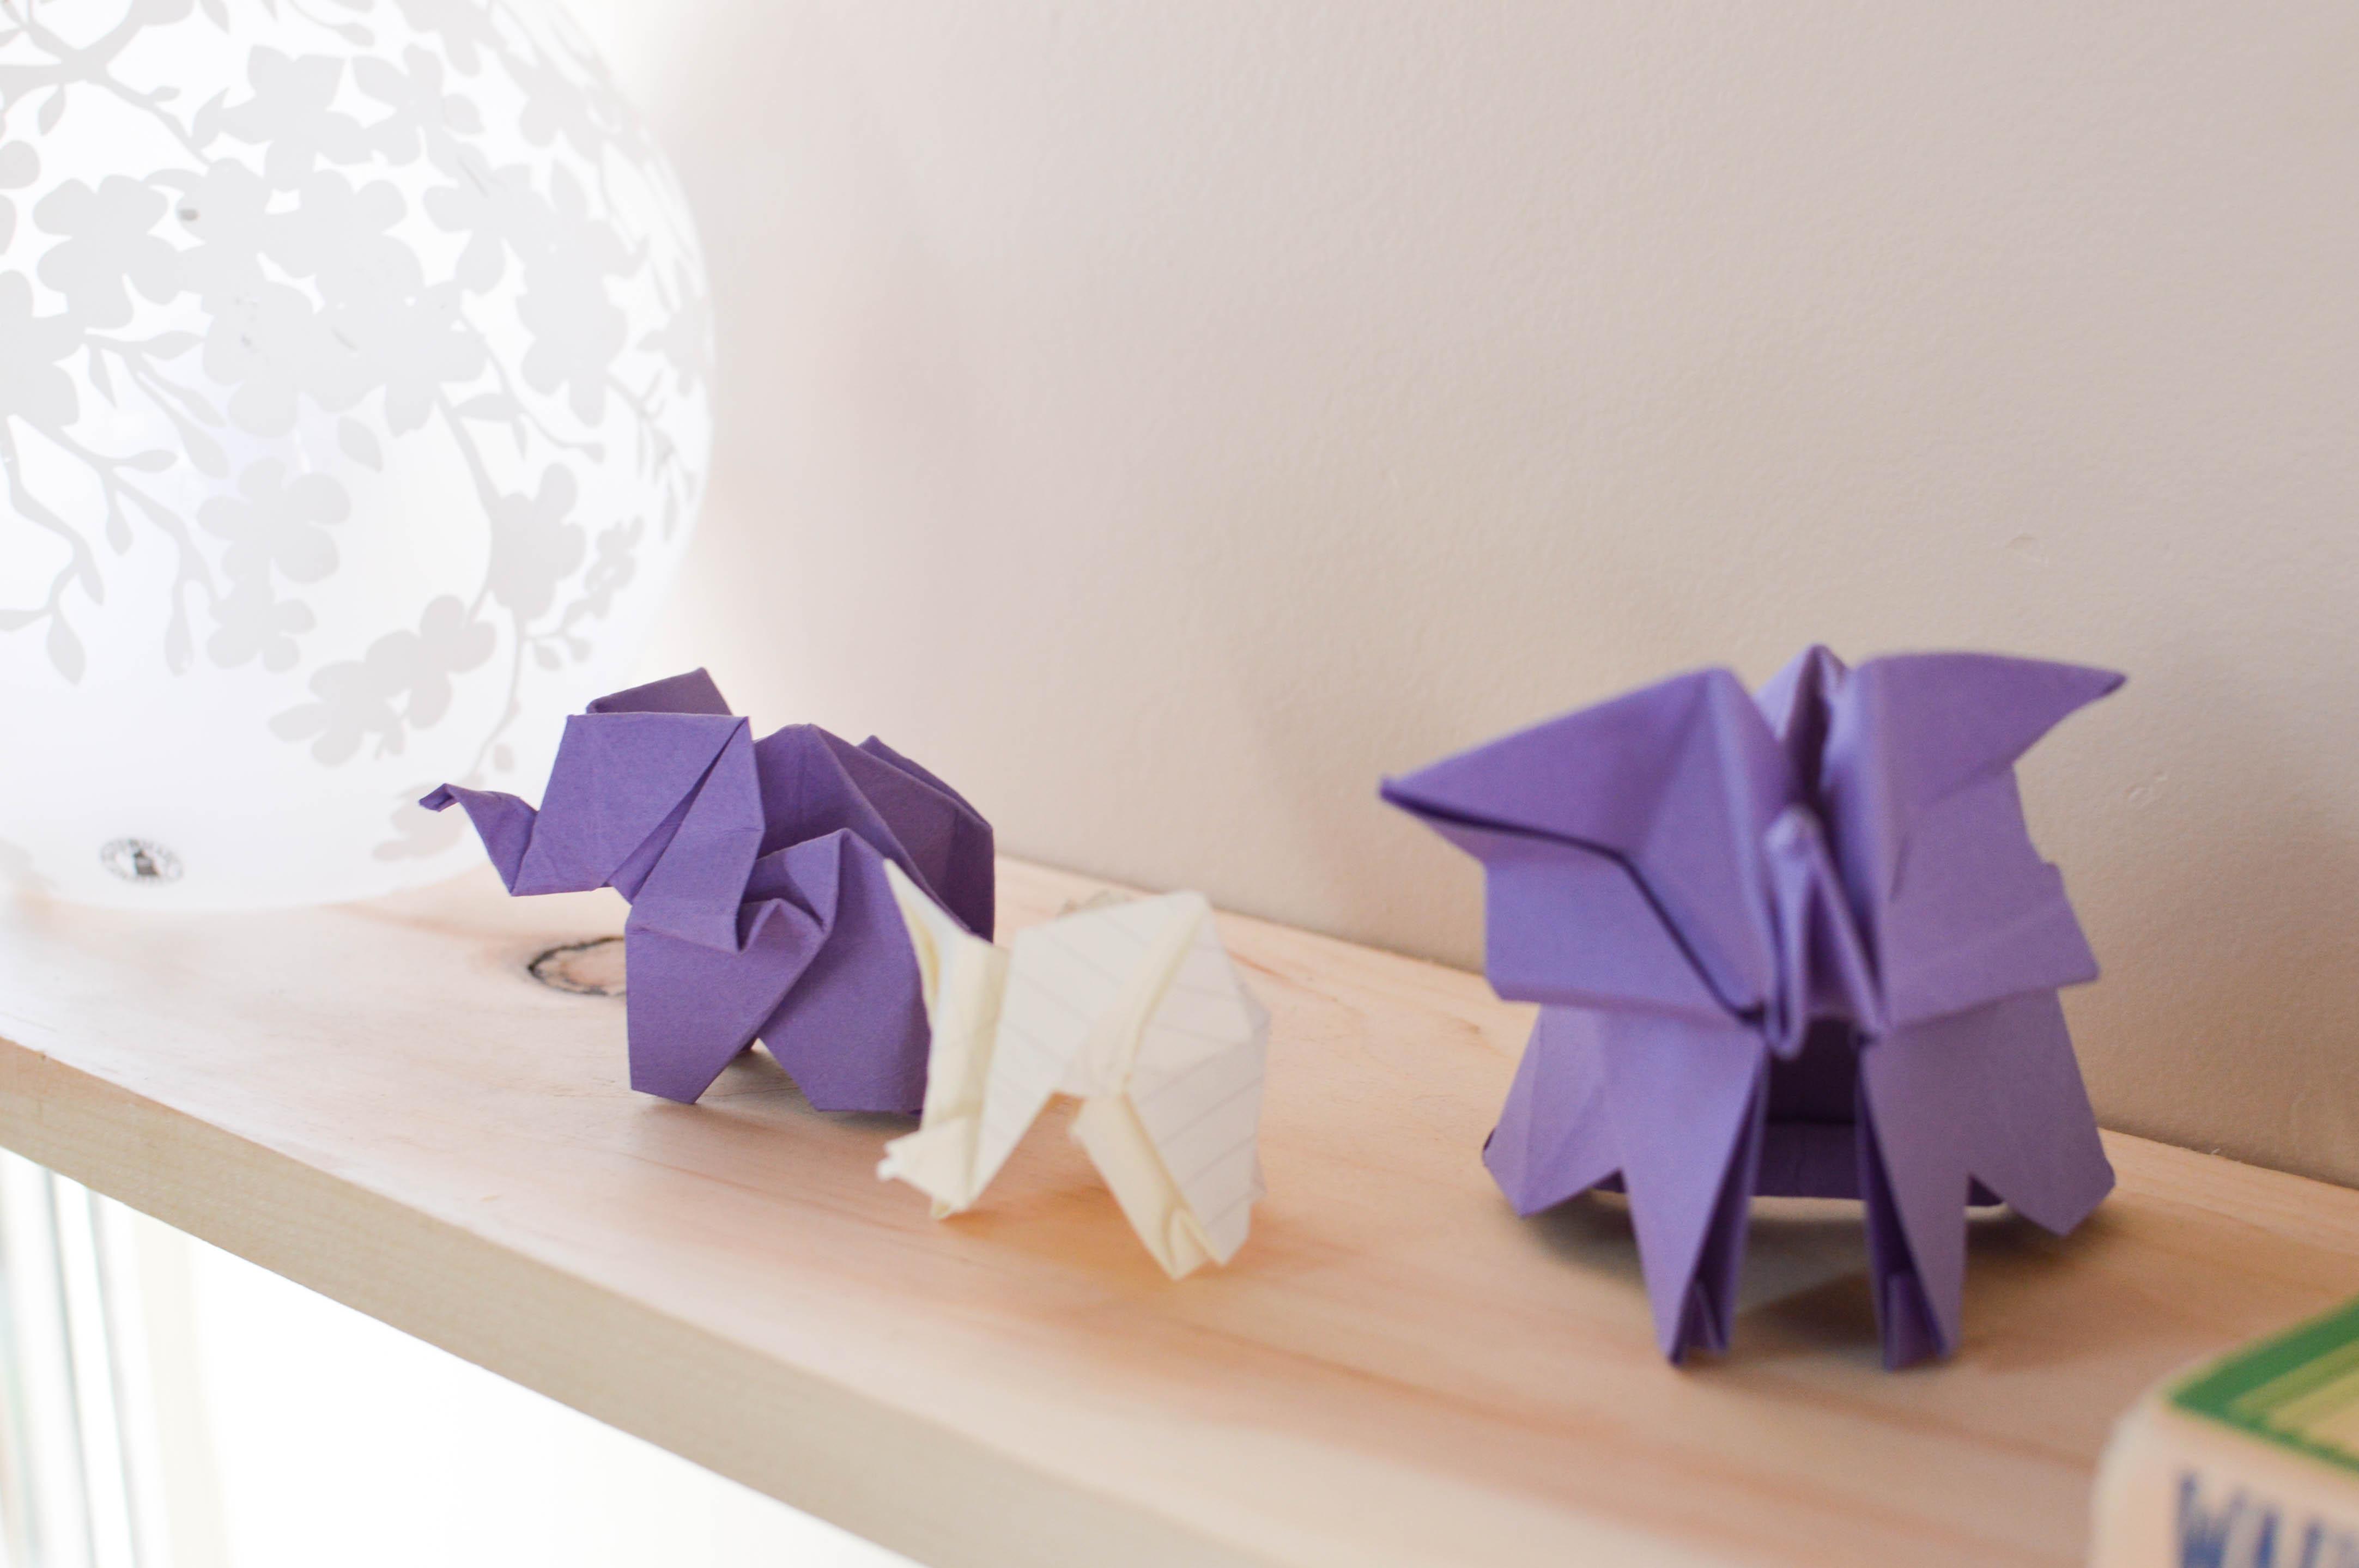 Origami elephants sit on a wooden shelf